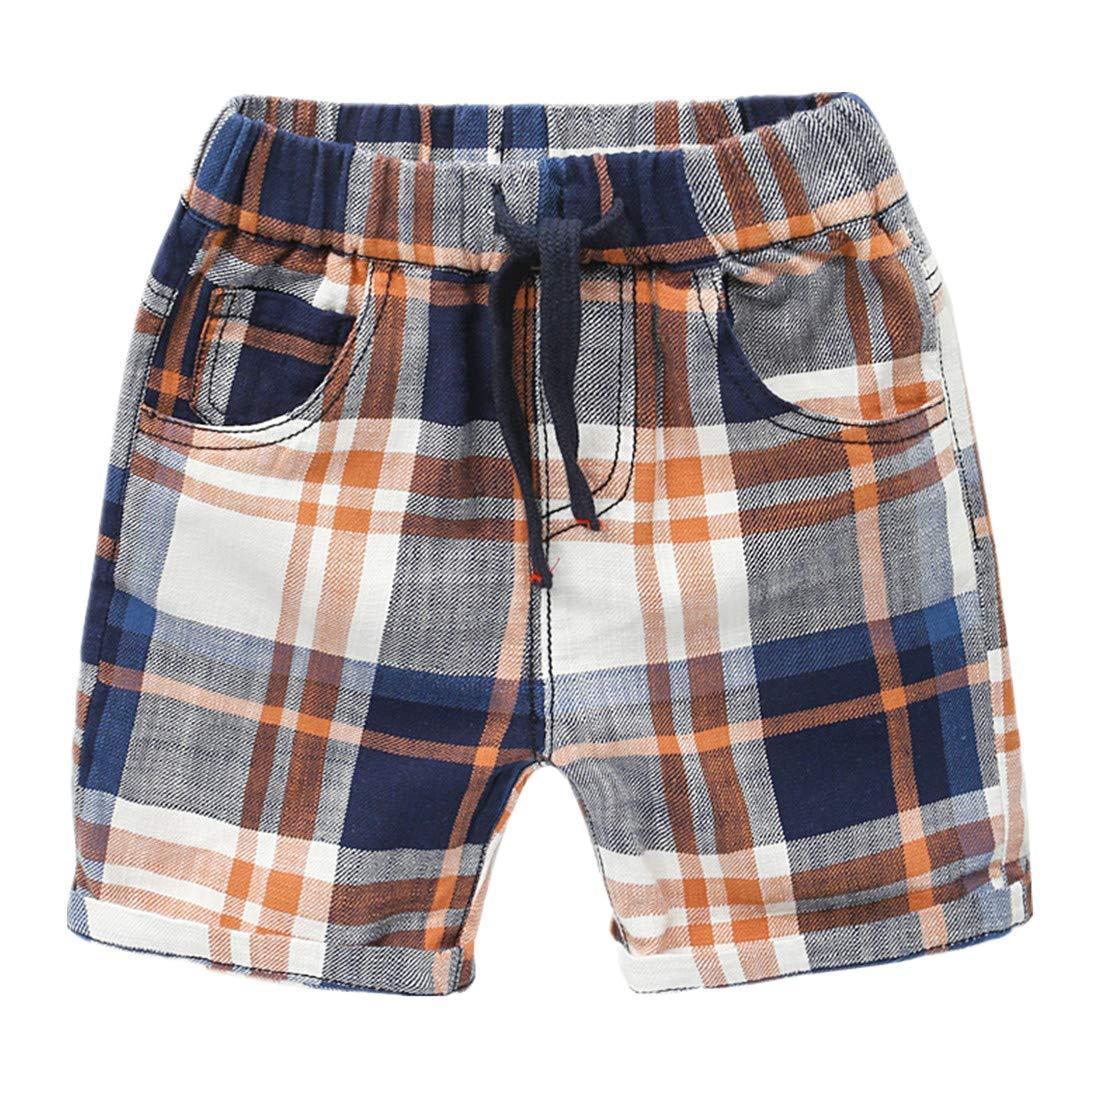 Sooxiwood Little Boys Shorts Plaid Pocket Casual